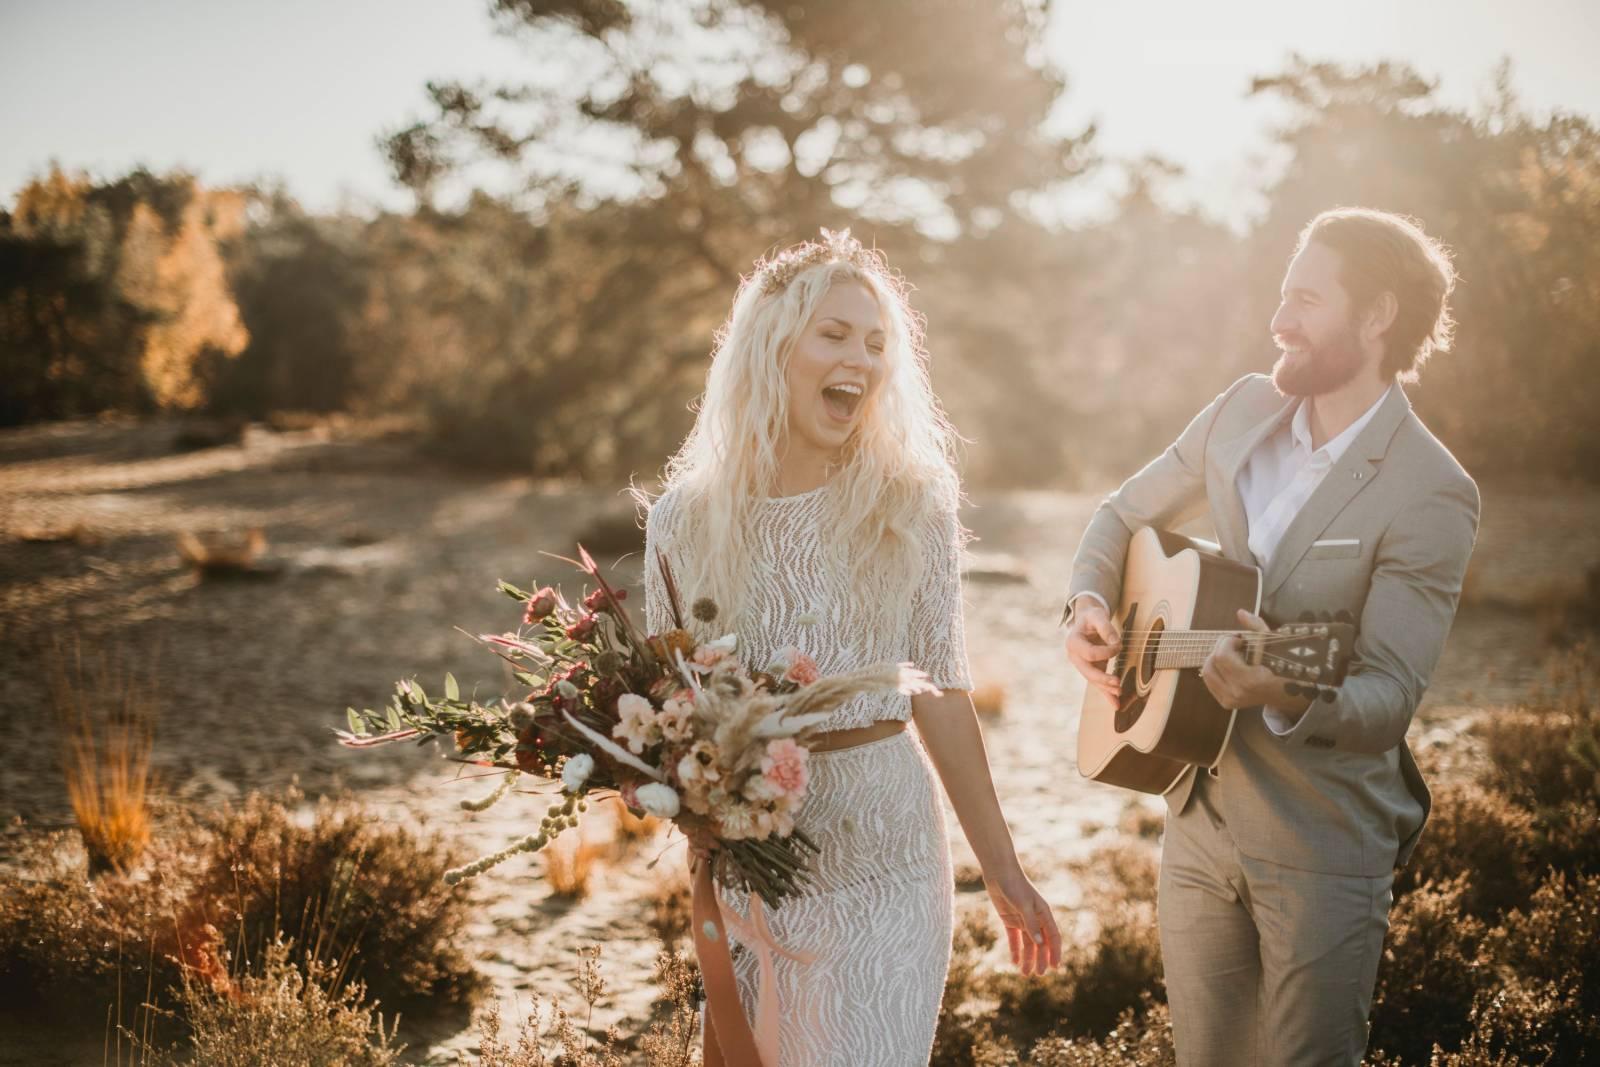 Collart & Willems - Beauty - Bruidsmake-up - Make-up Bruid - House of Weddings - 13